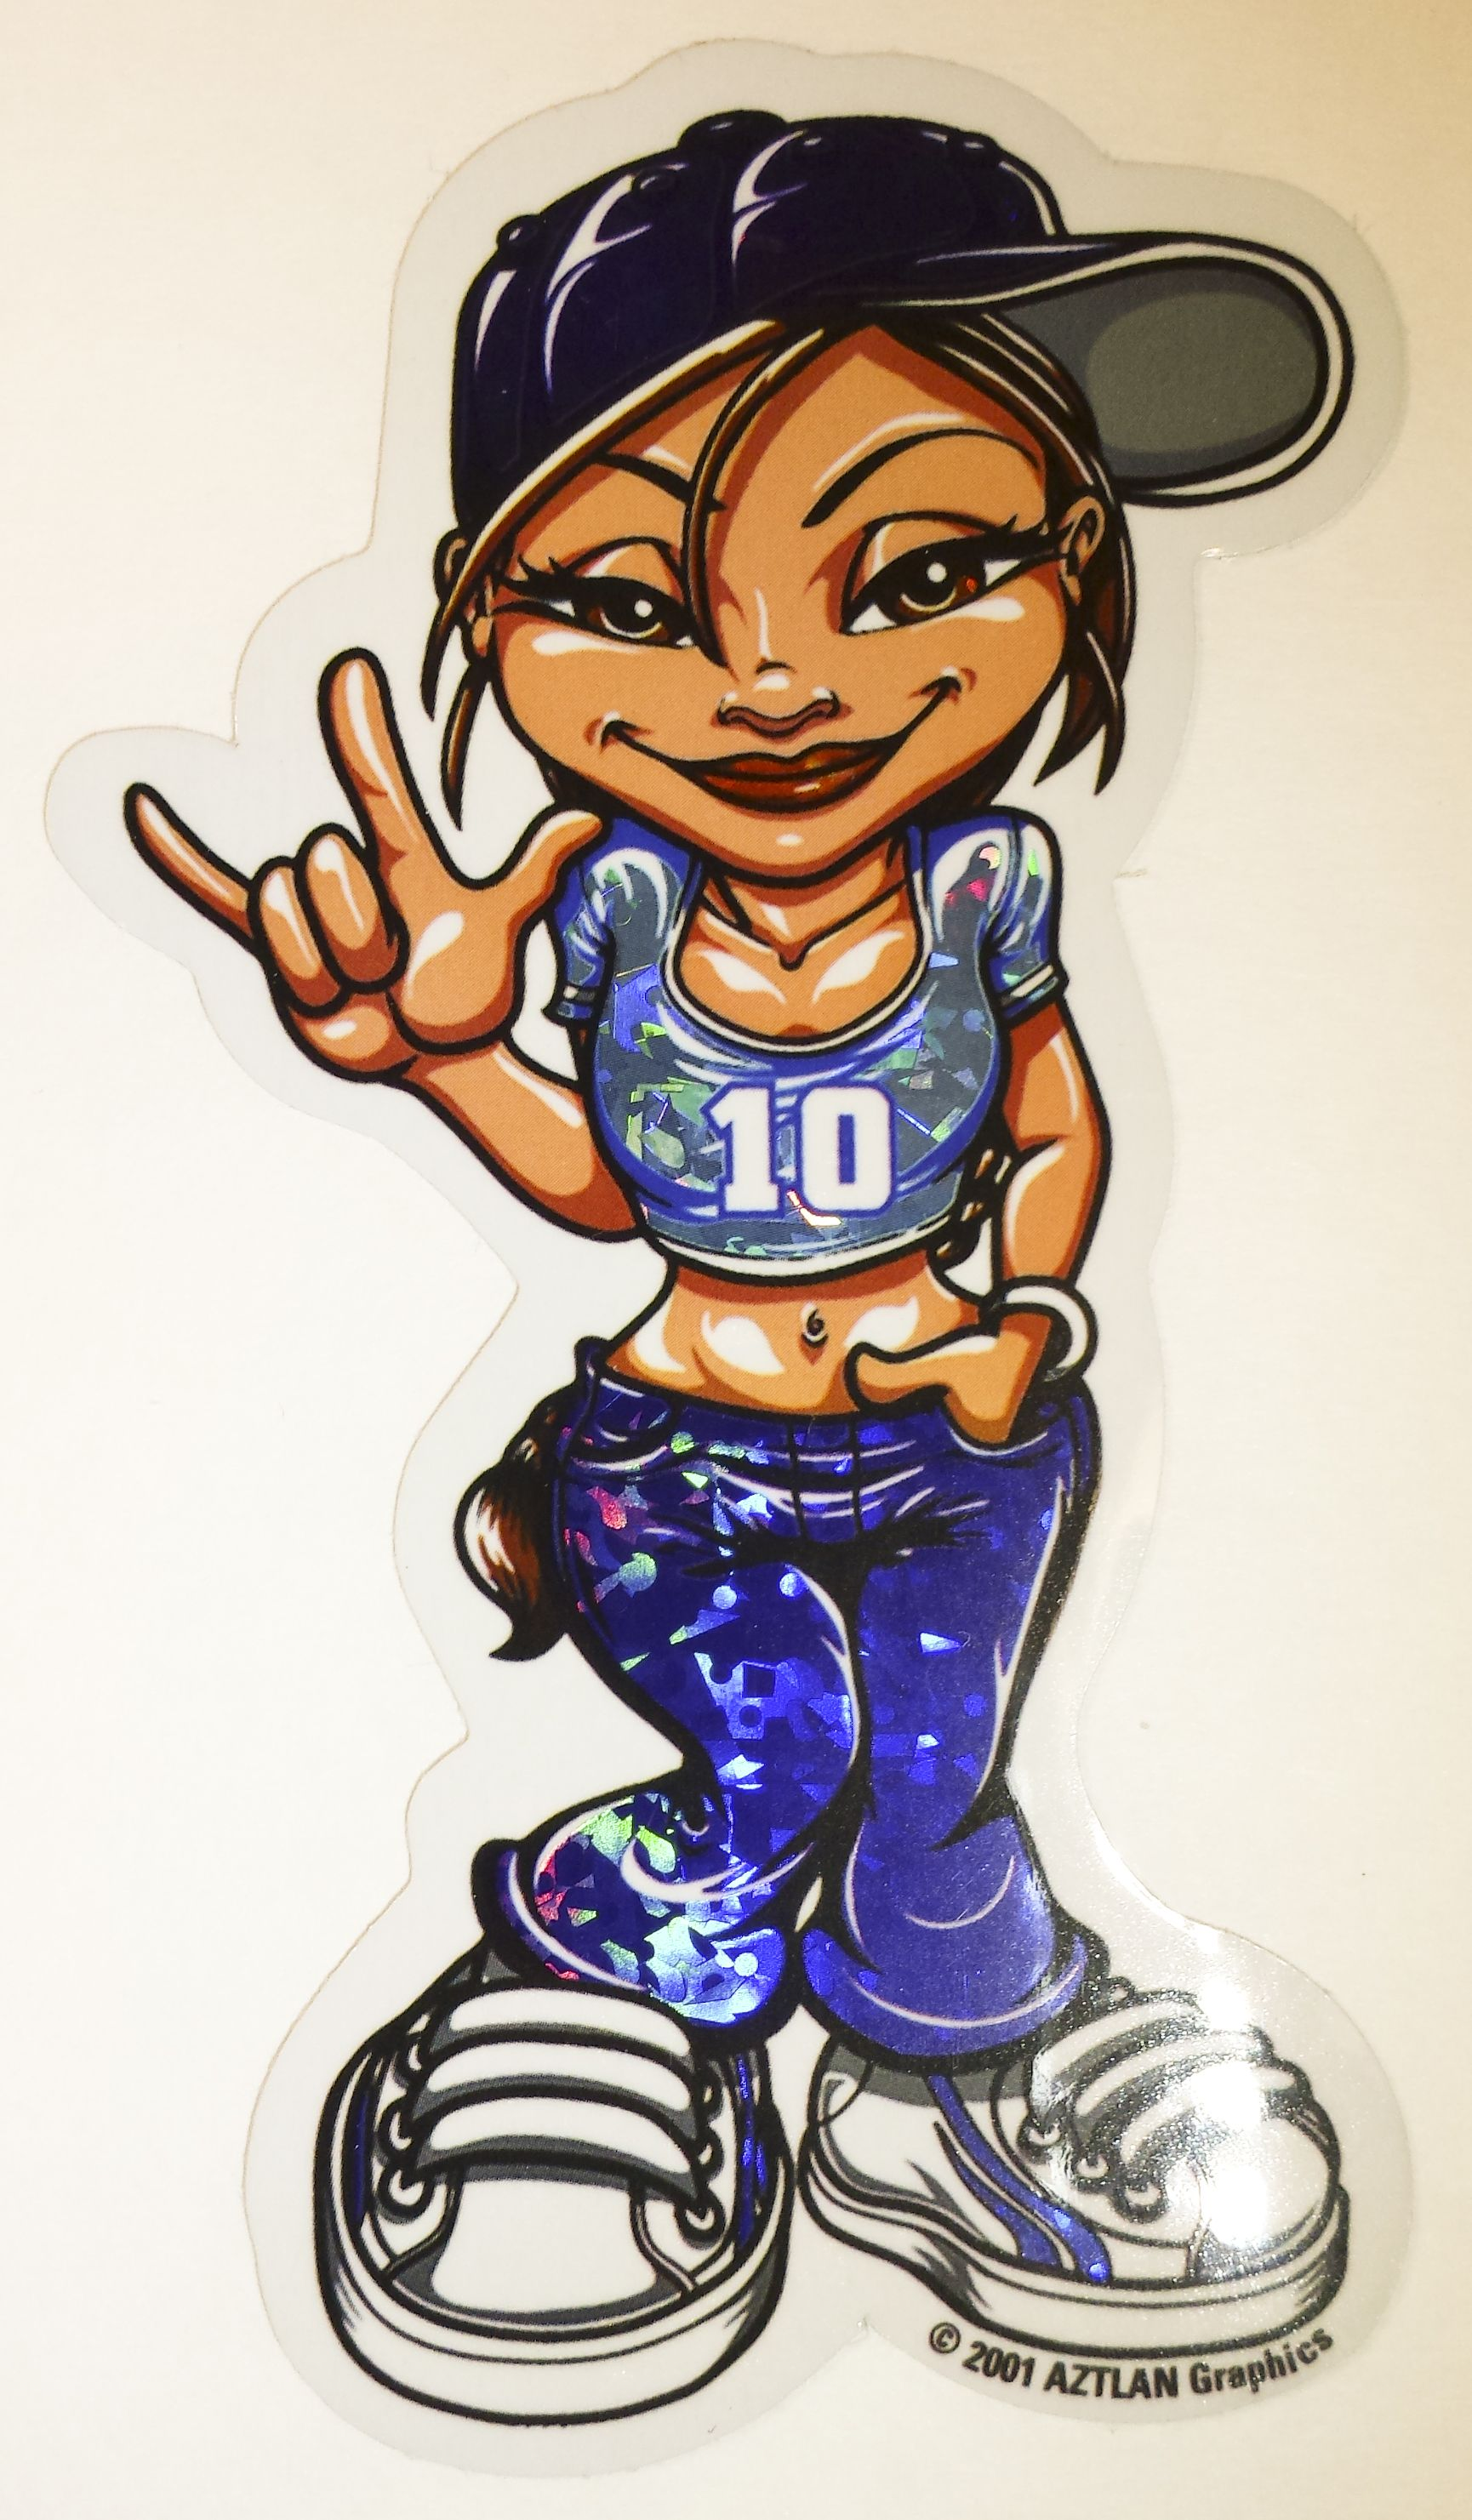 Hip hop girl sticker shes a 10